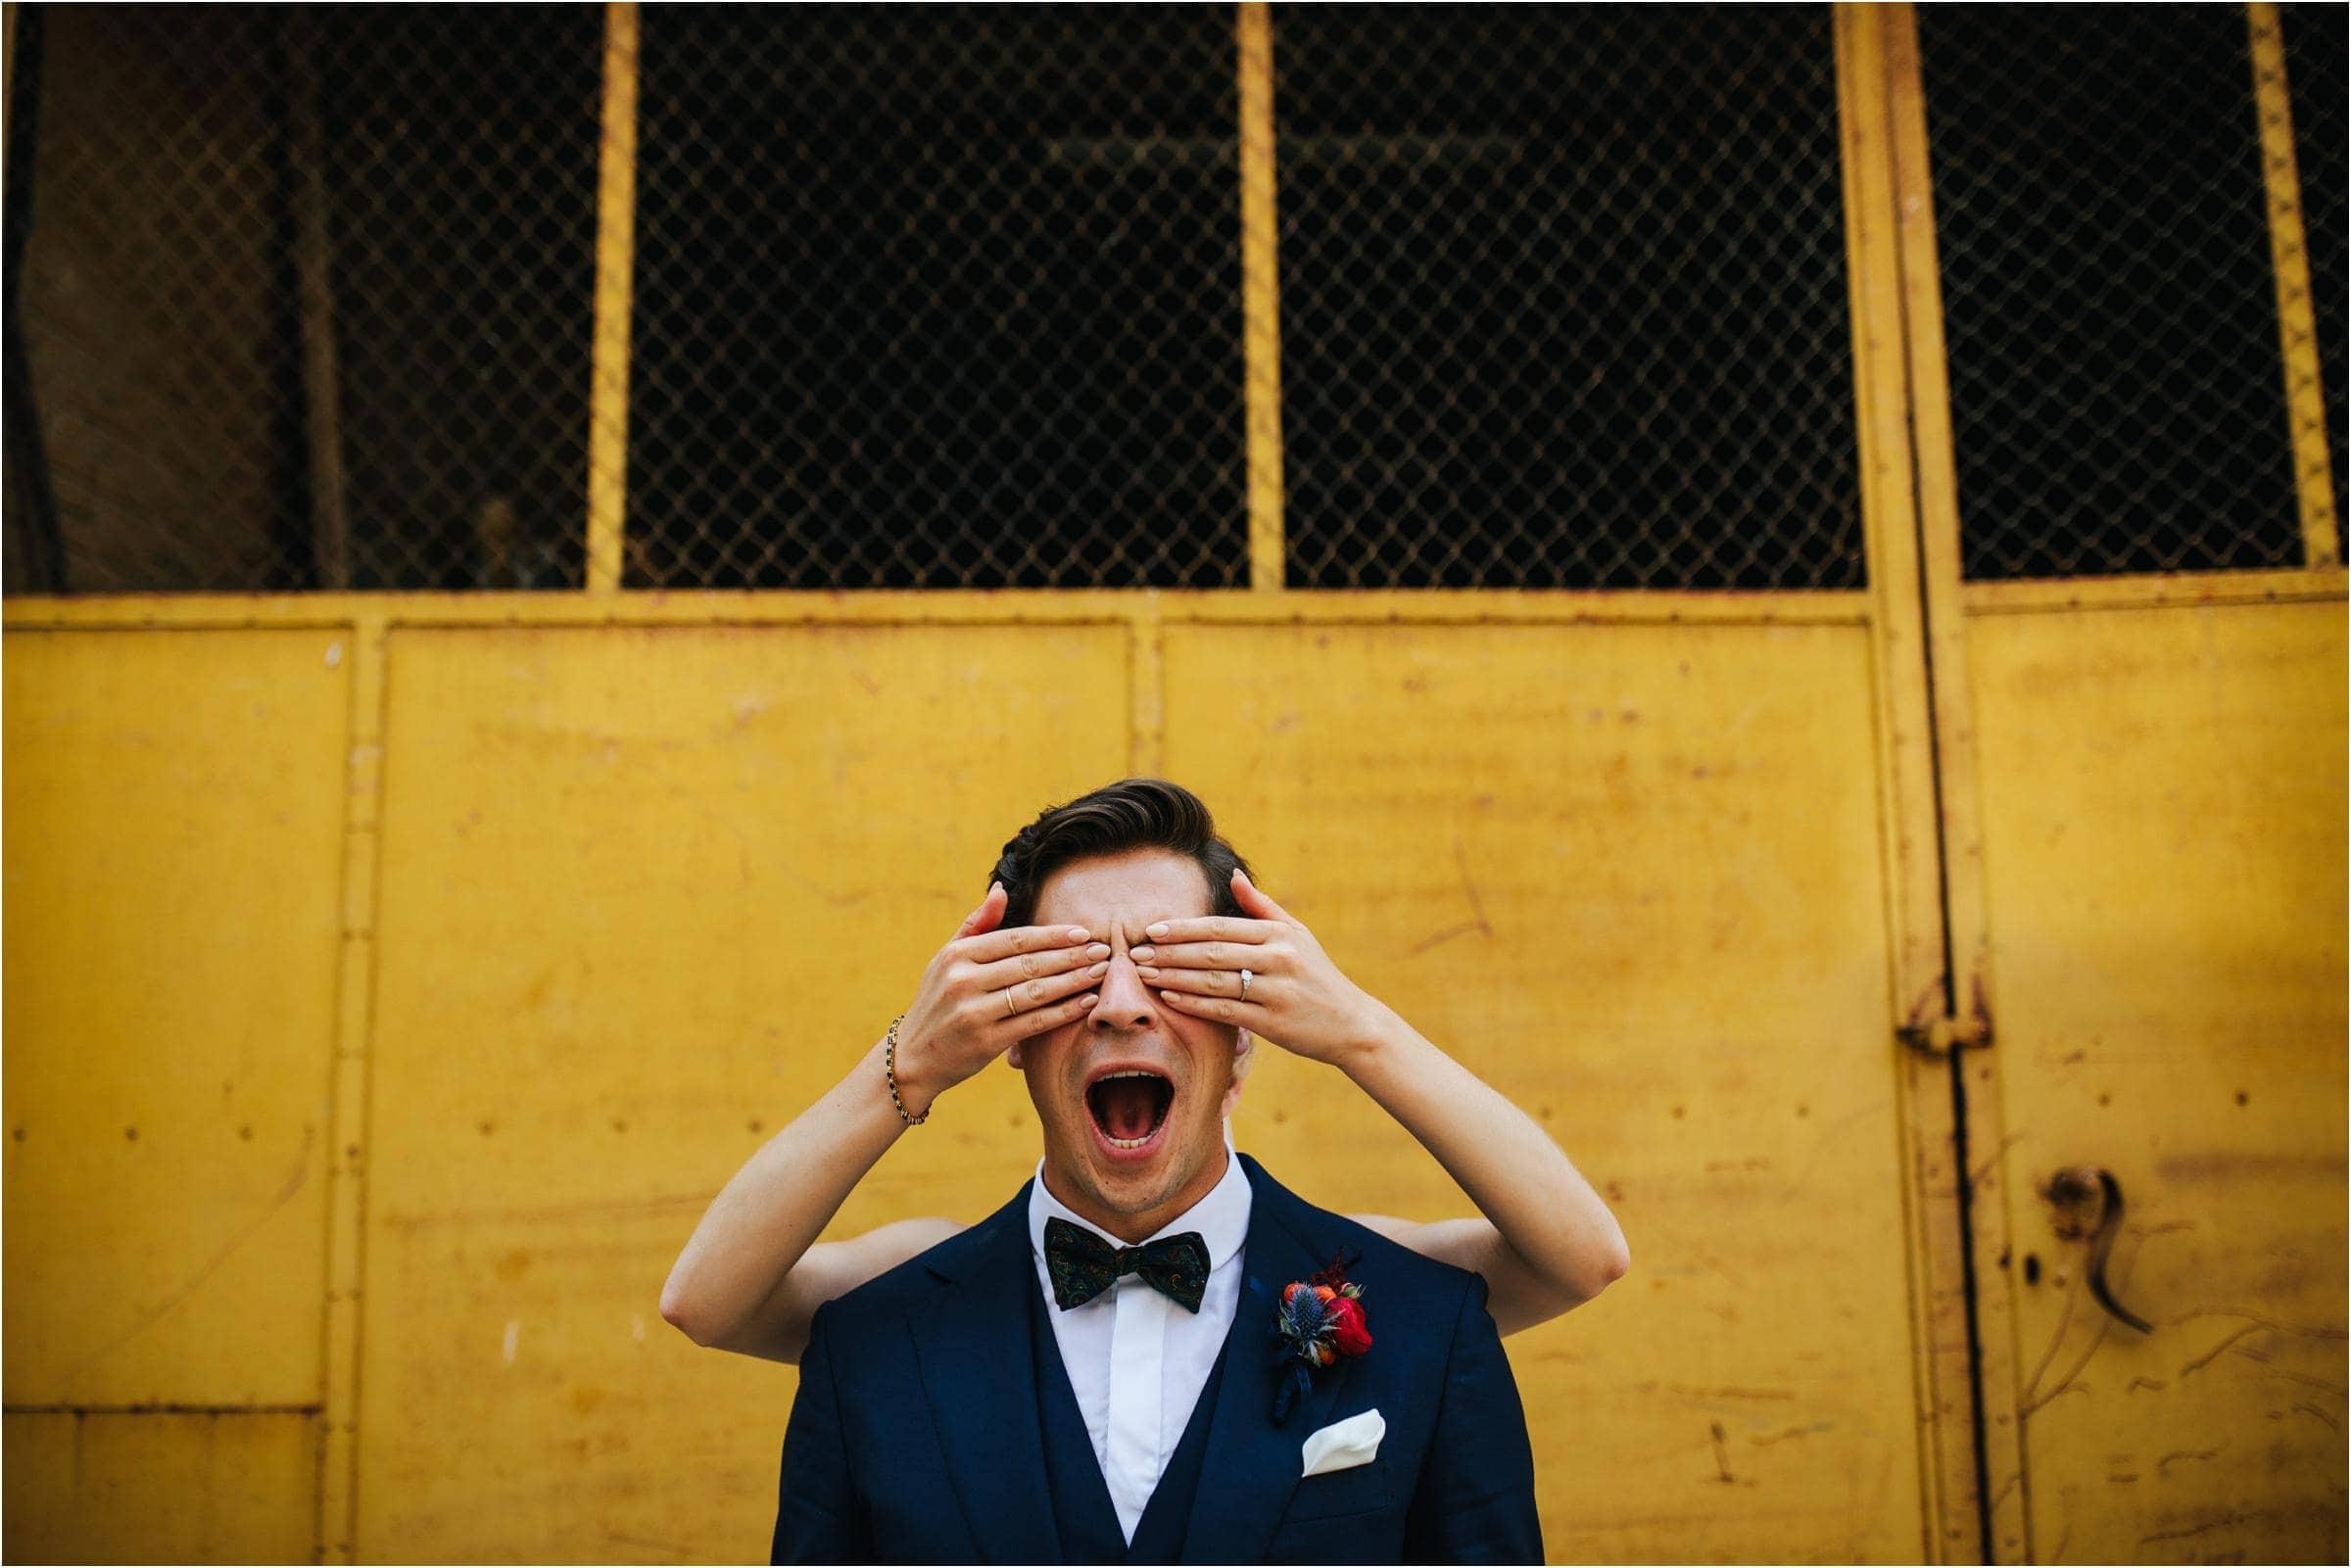 A photograph taken by a france wedding photographer